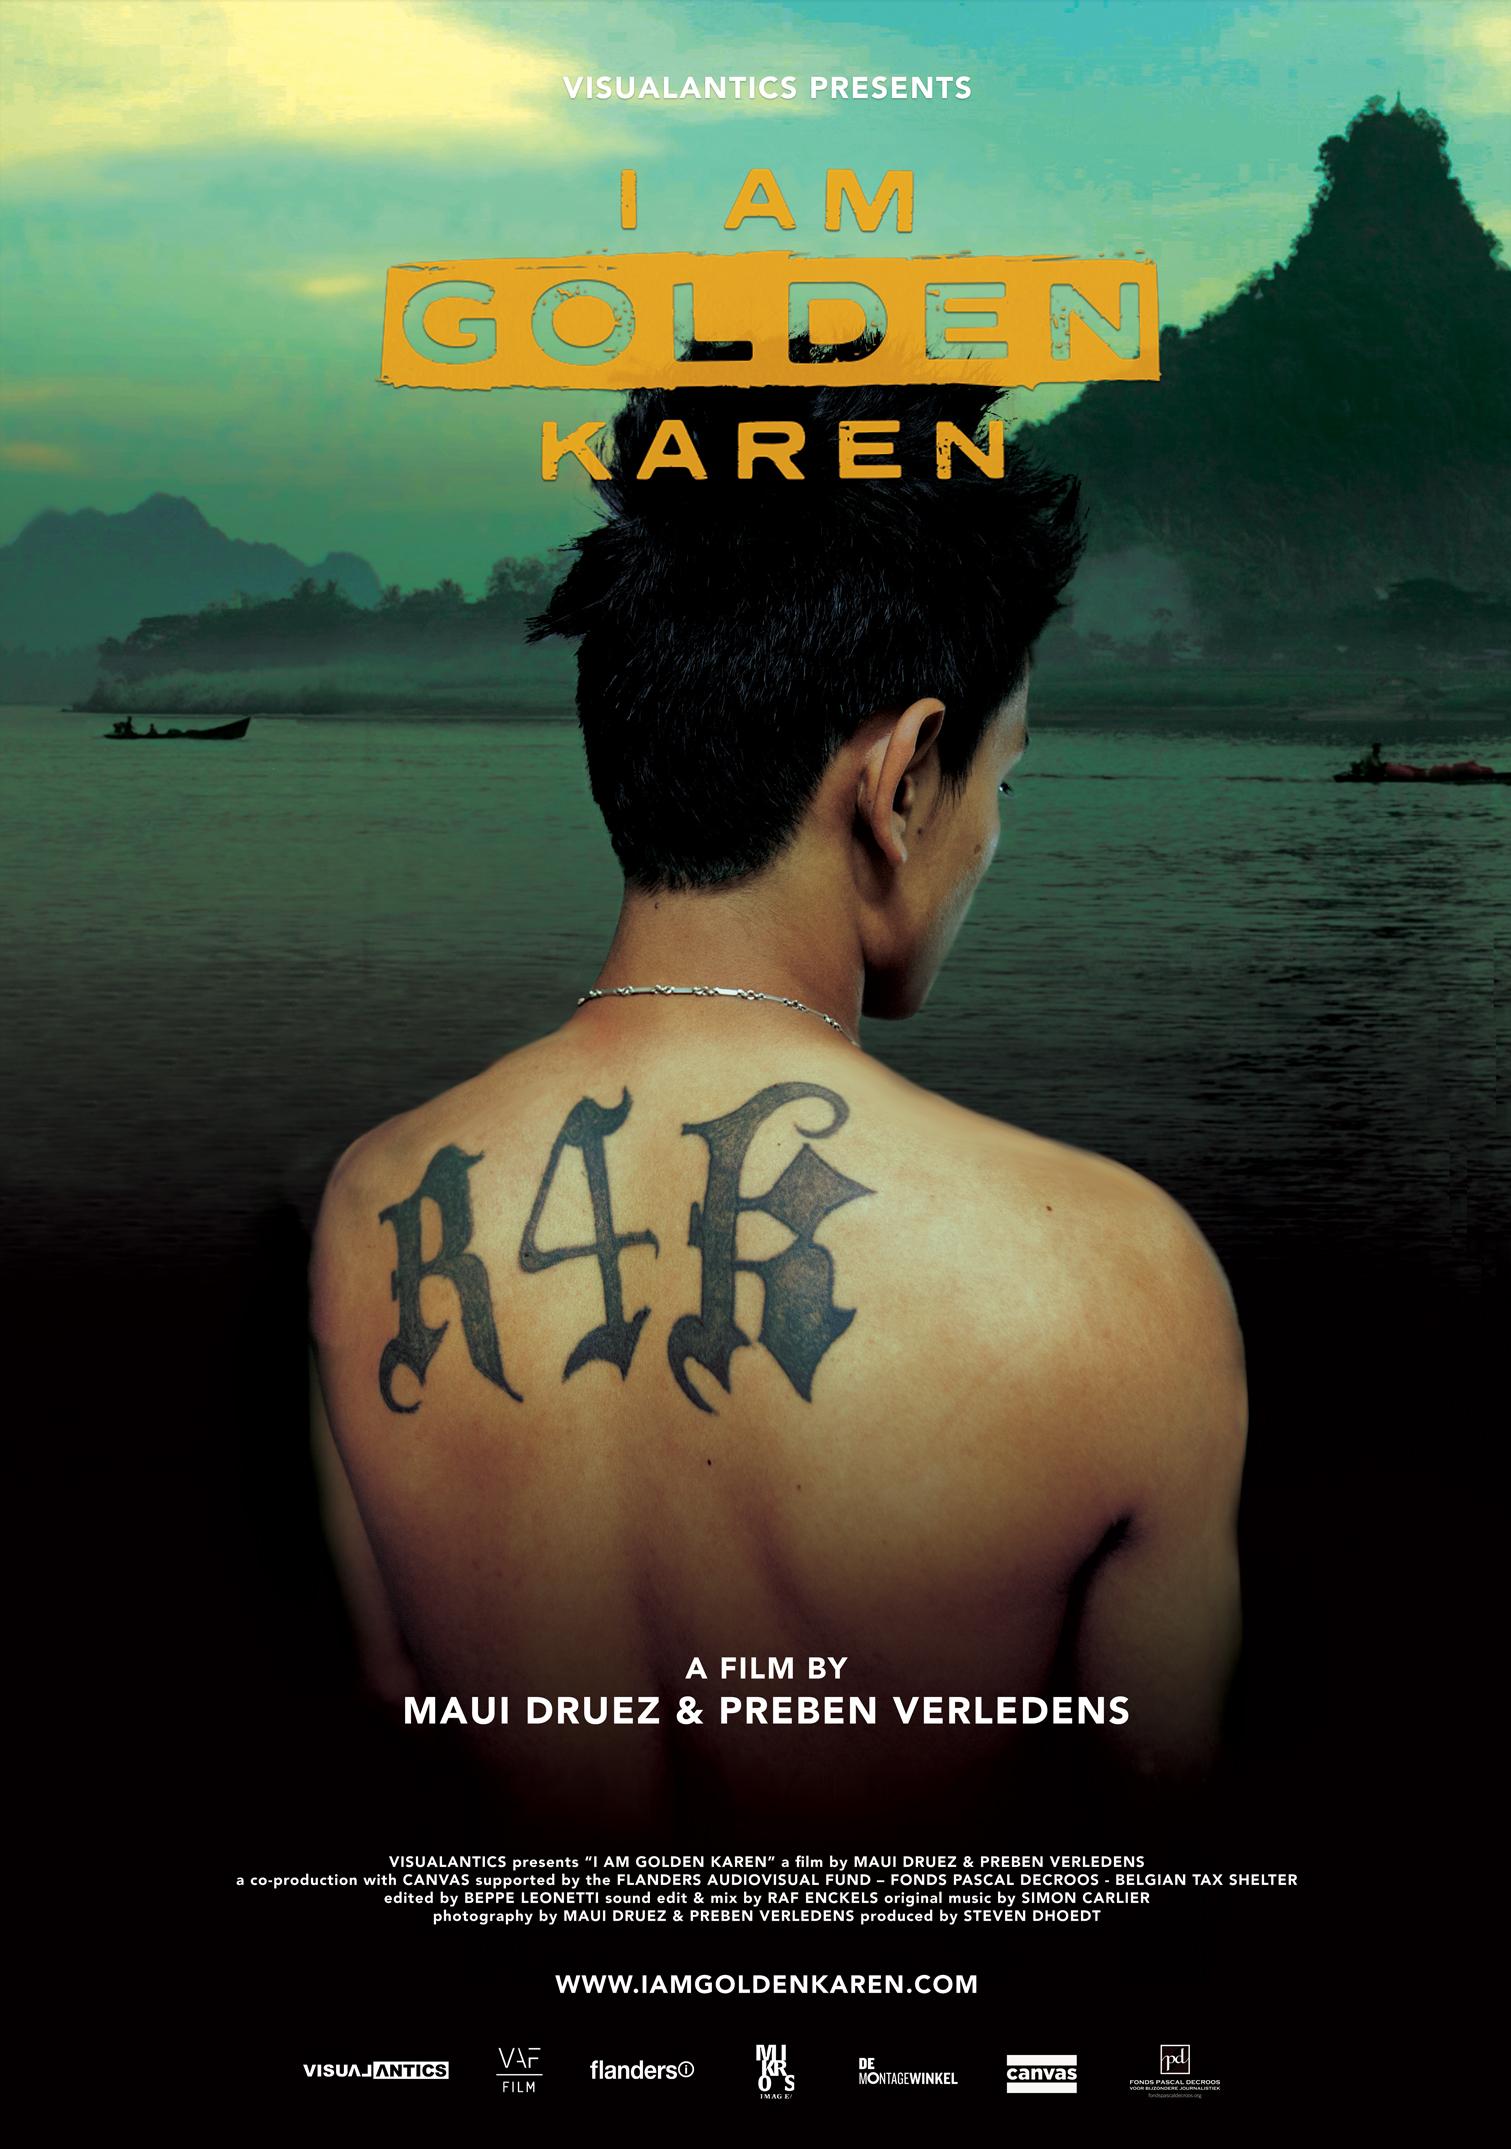 1803019-KAREN-Poster-Web.jpg